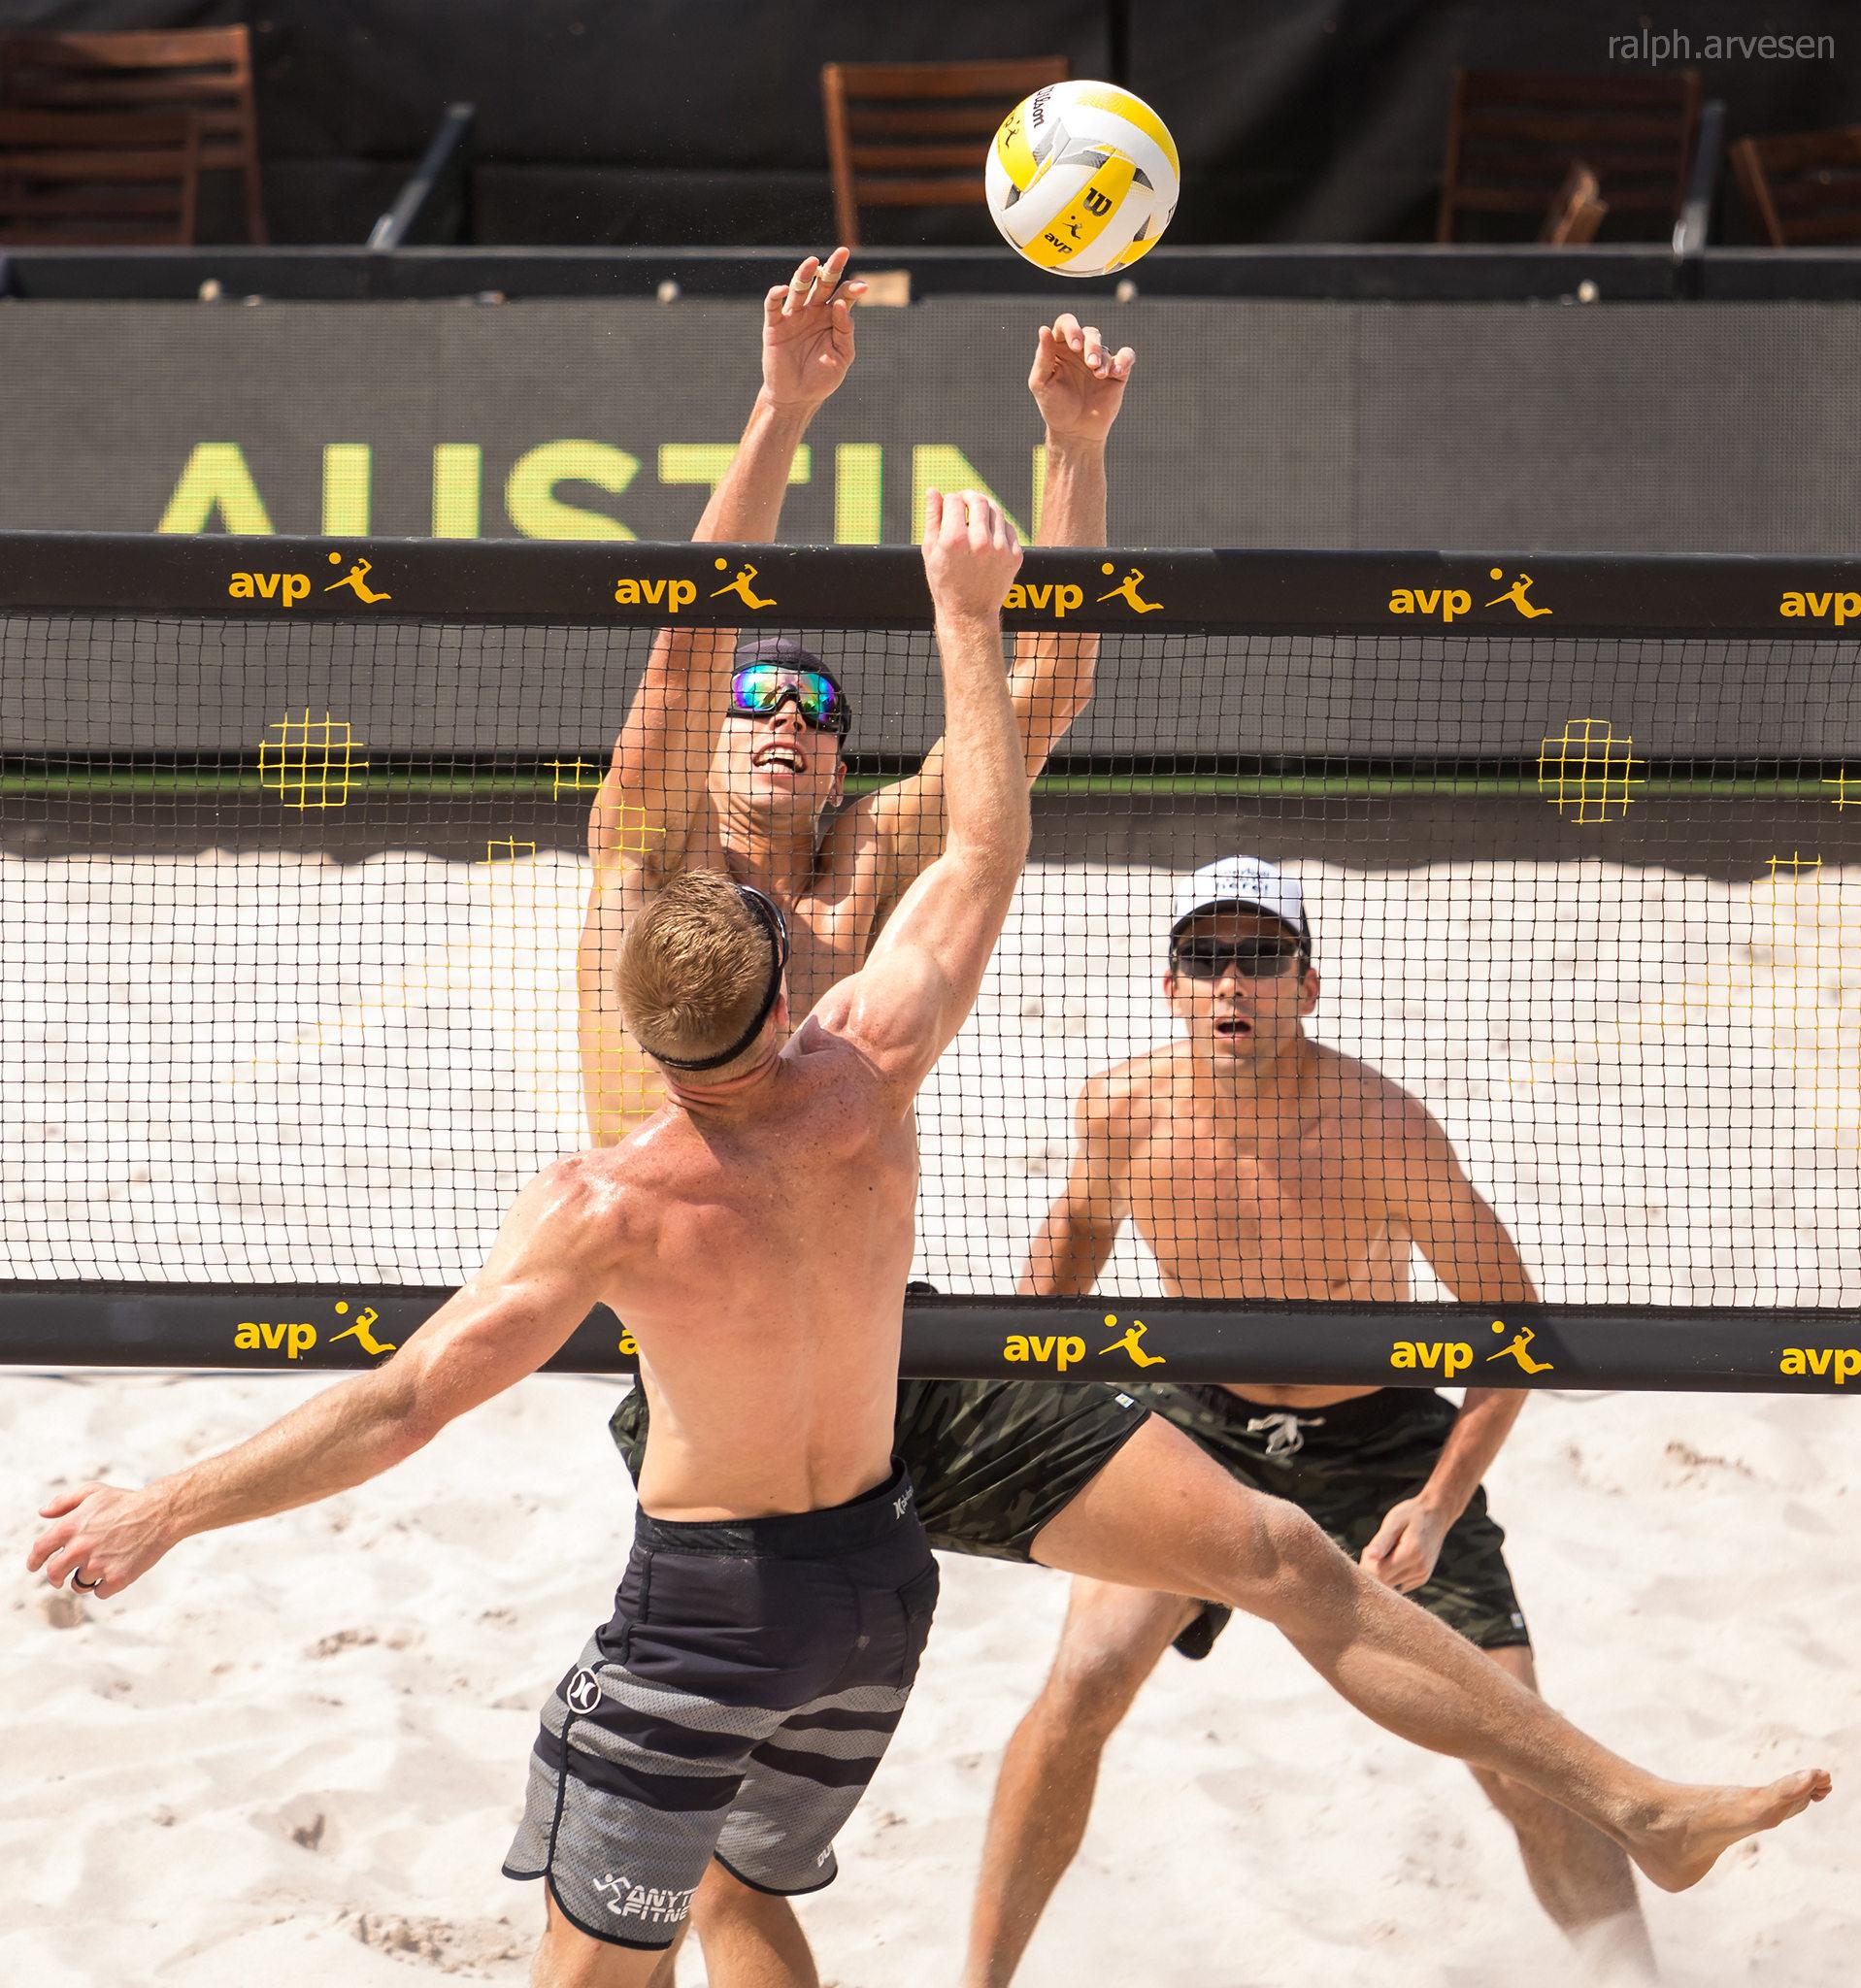 d9b28a28deb File AVP Professional Beach Volleyball in Austin